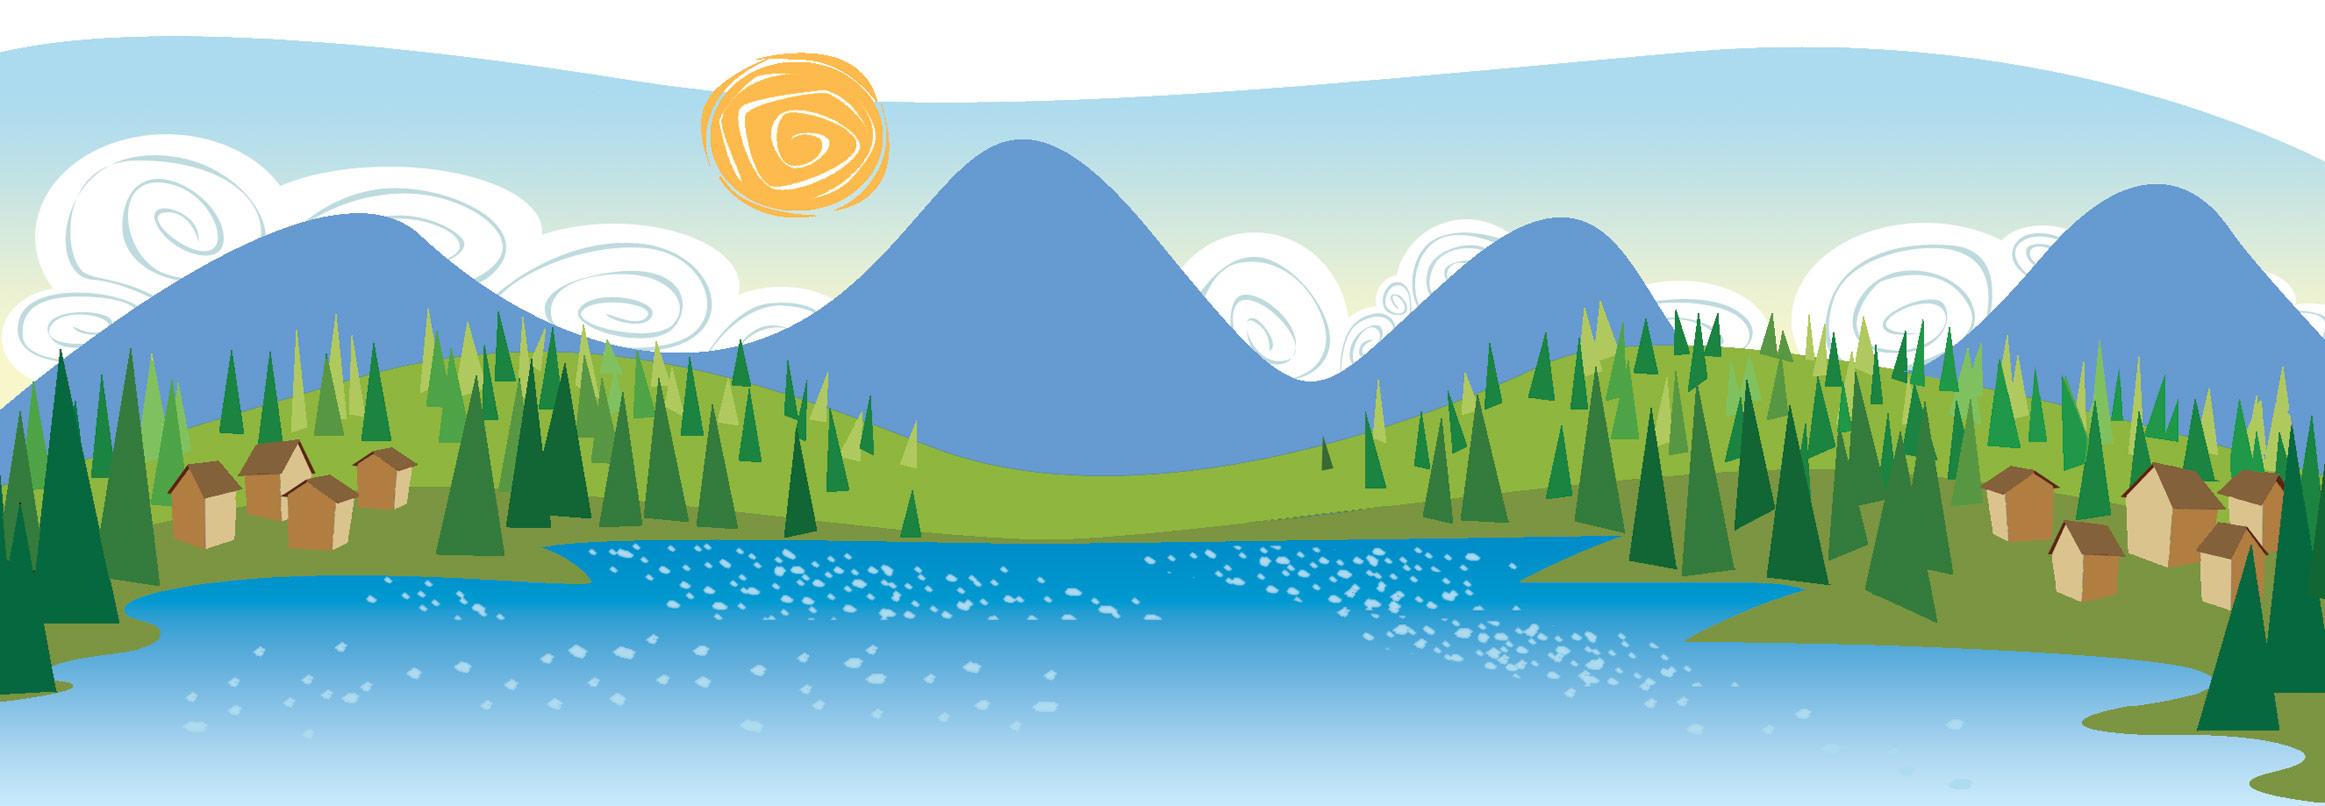 banner freeuse stock Landscape clipart. Clip art free panda.